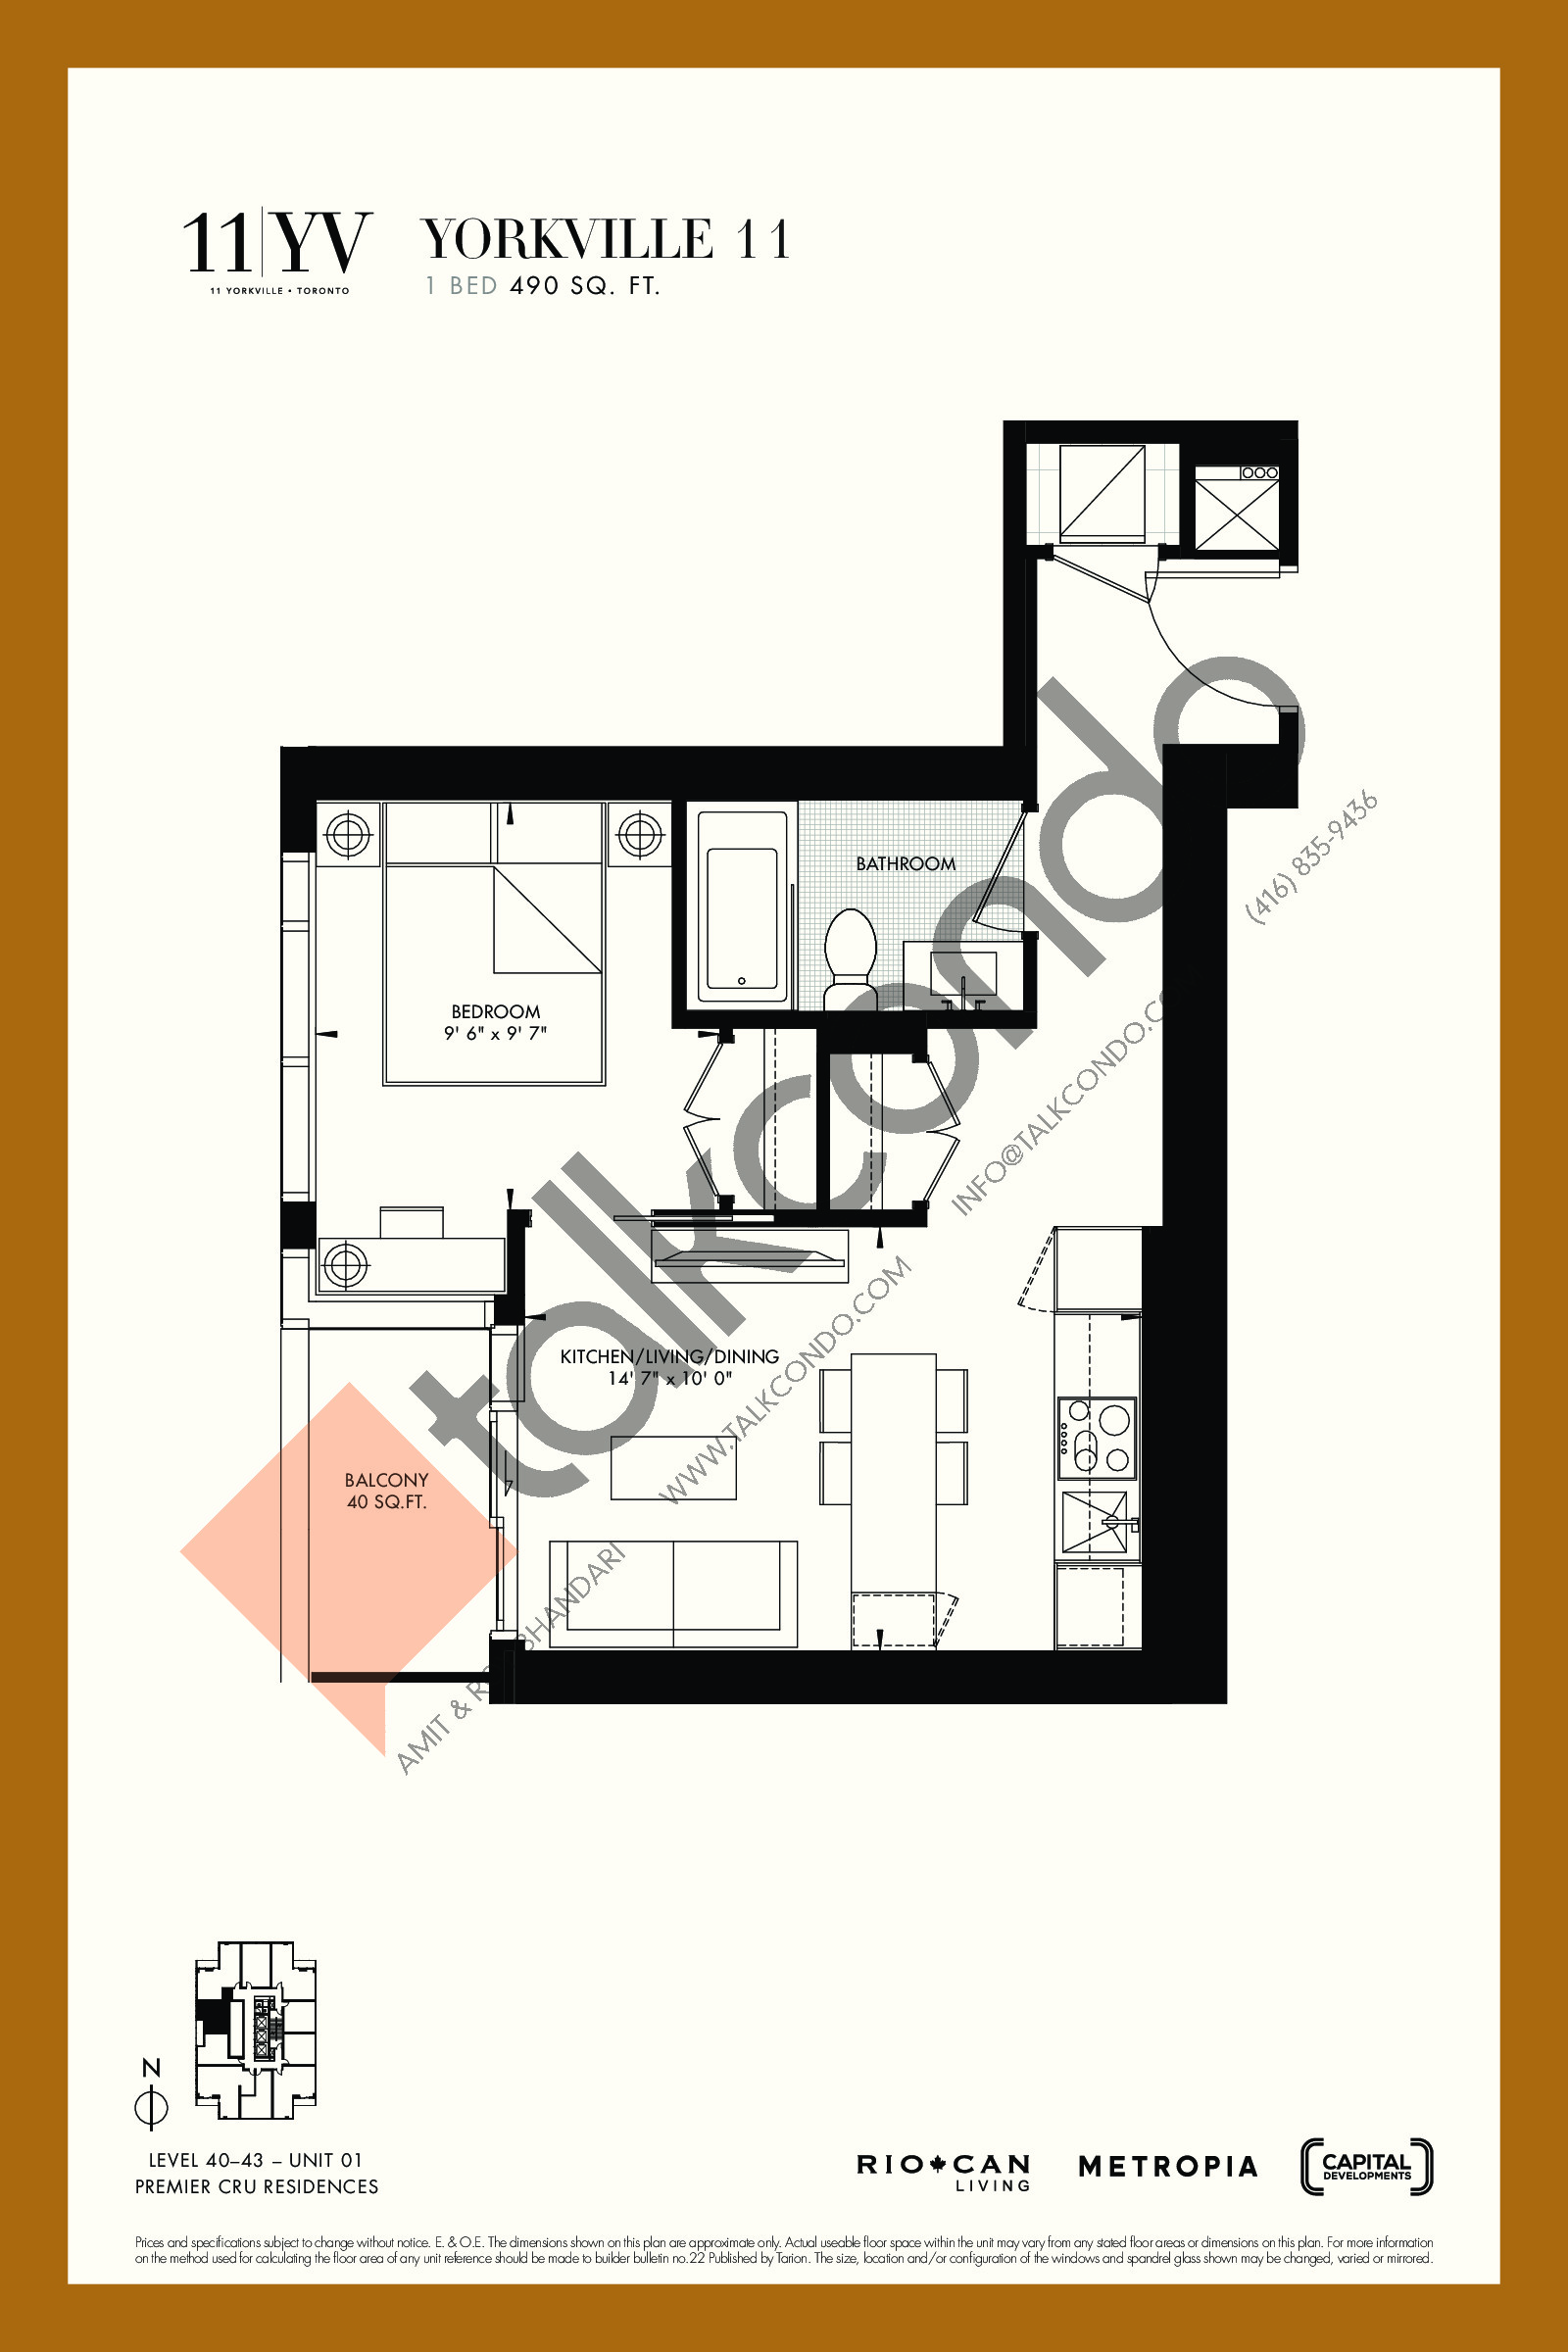 Yorkville 11 Floor Plan at 11YV Condos - 490 sq.ft